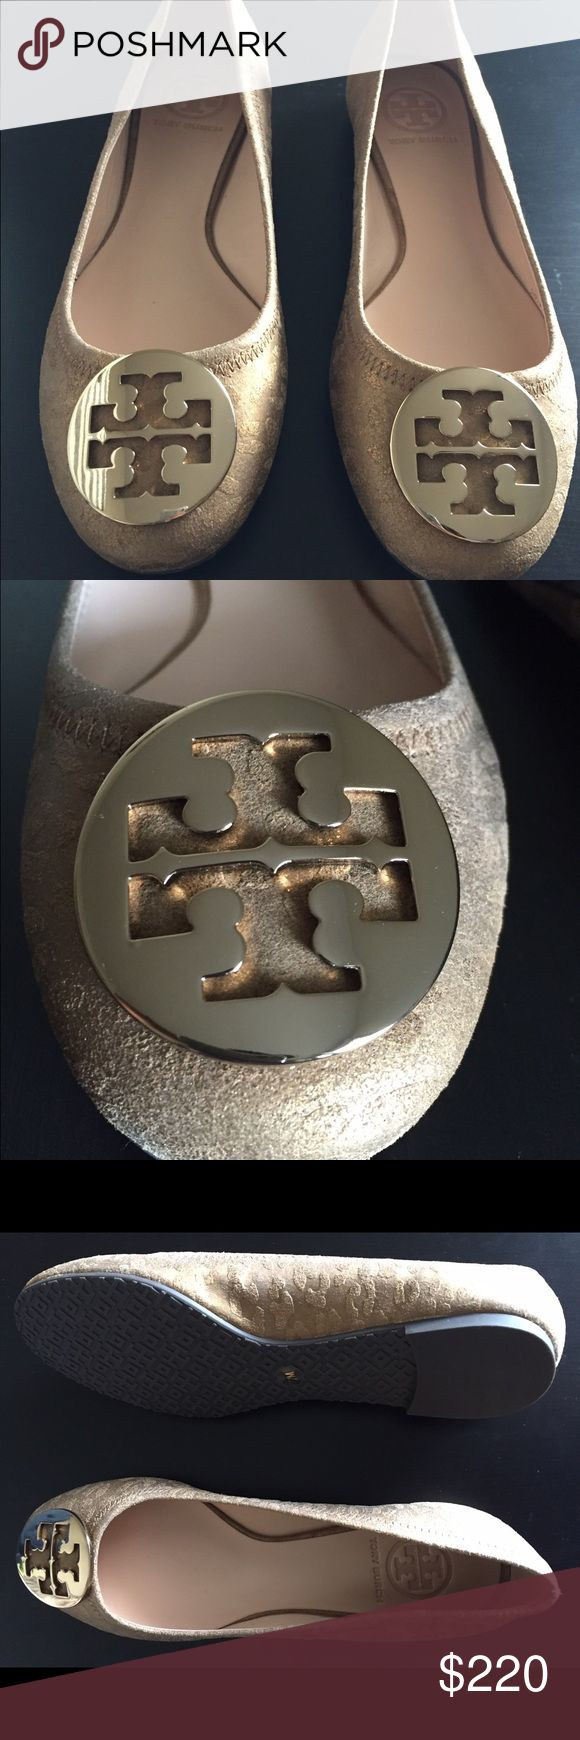 "Tory Burch ""Reva"" Ballet Flats (US Size 7M) Type:Flats Size:7M Width:Regular (M, B) Heel Height:Flat Brand:Tory Burch Color:Bronze  BRAND NEW ITEM W/O BOX!! Tory Burch Shoes Flats & Loafers"